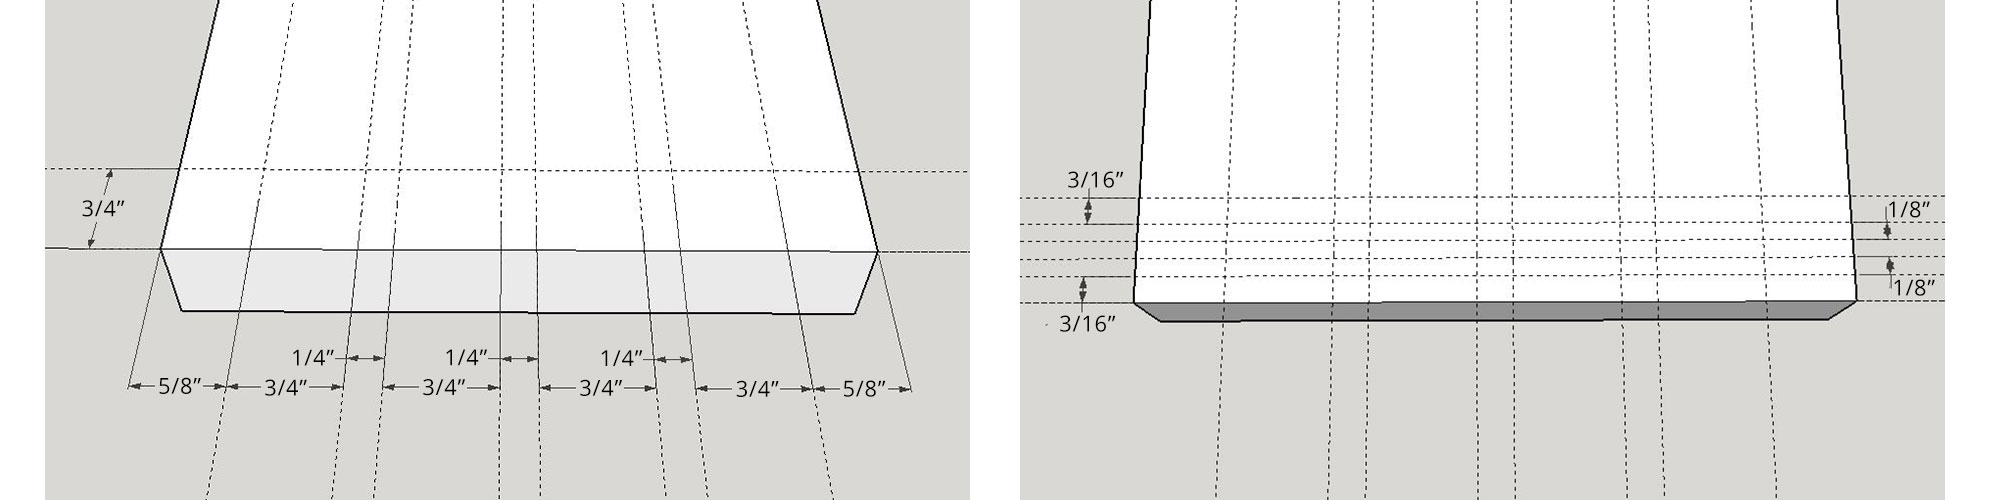 Left: Vertical spacing. Right: Horizontal spacing.